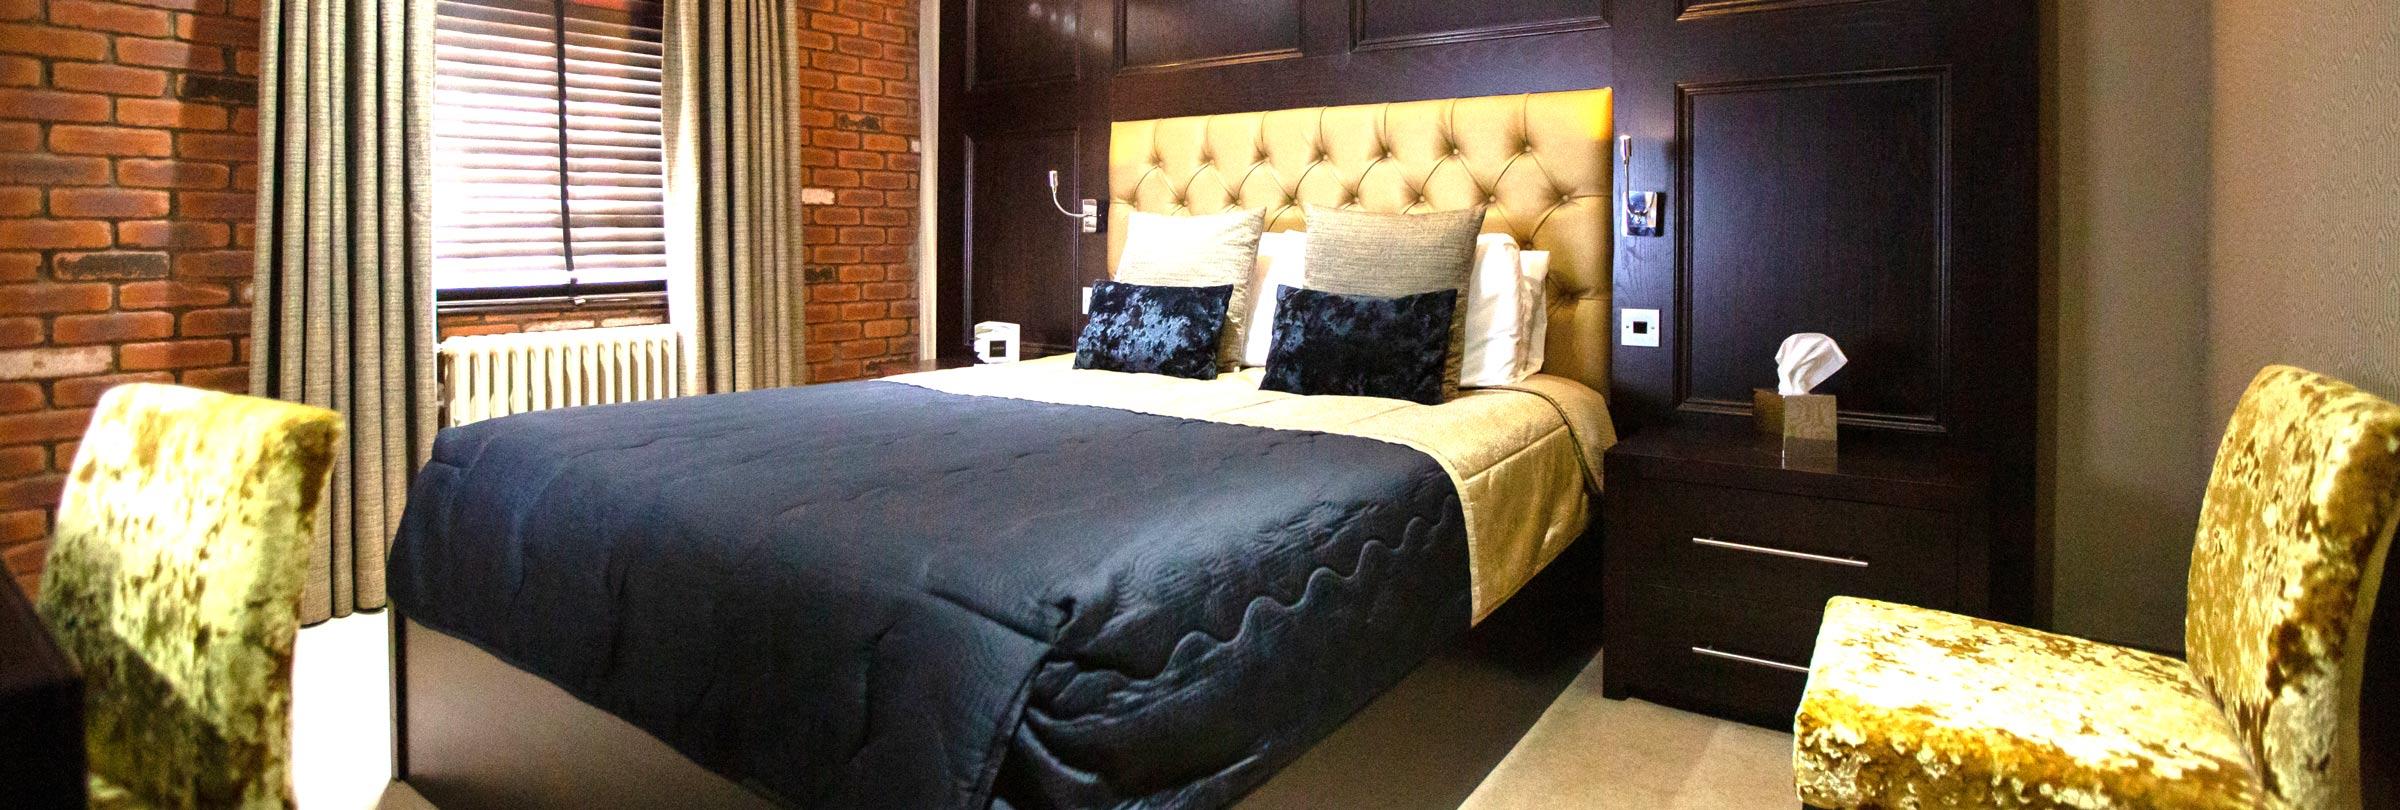 Wedding Hotel Accommodation 3